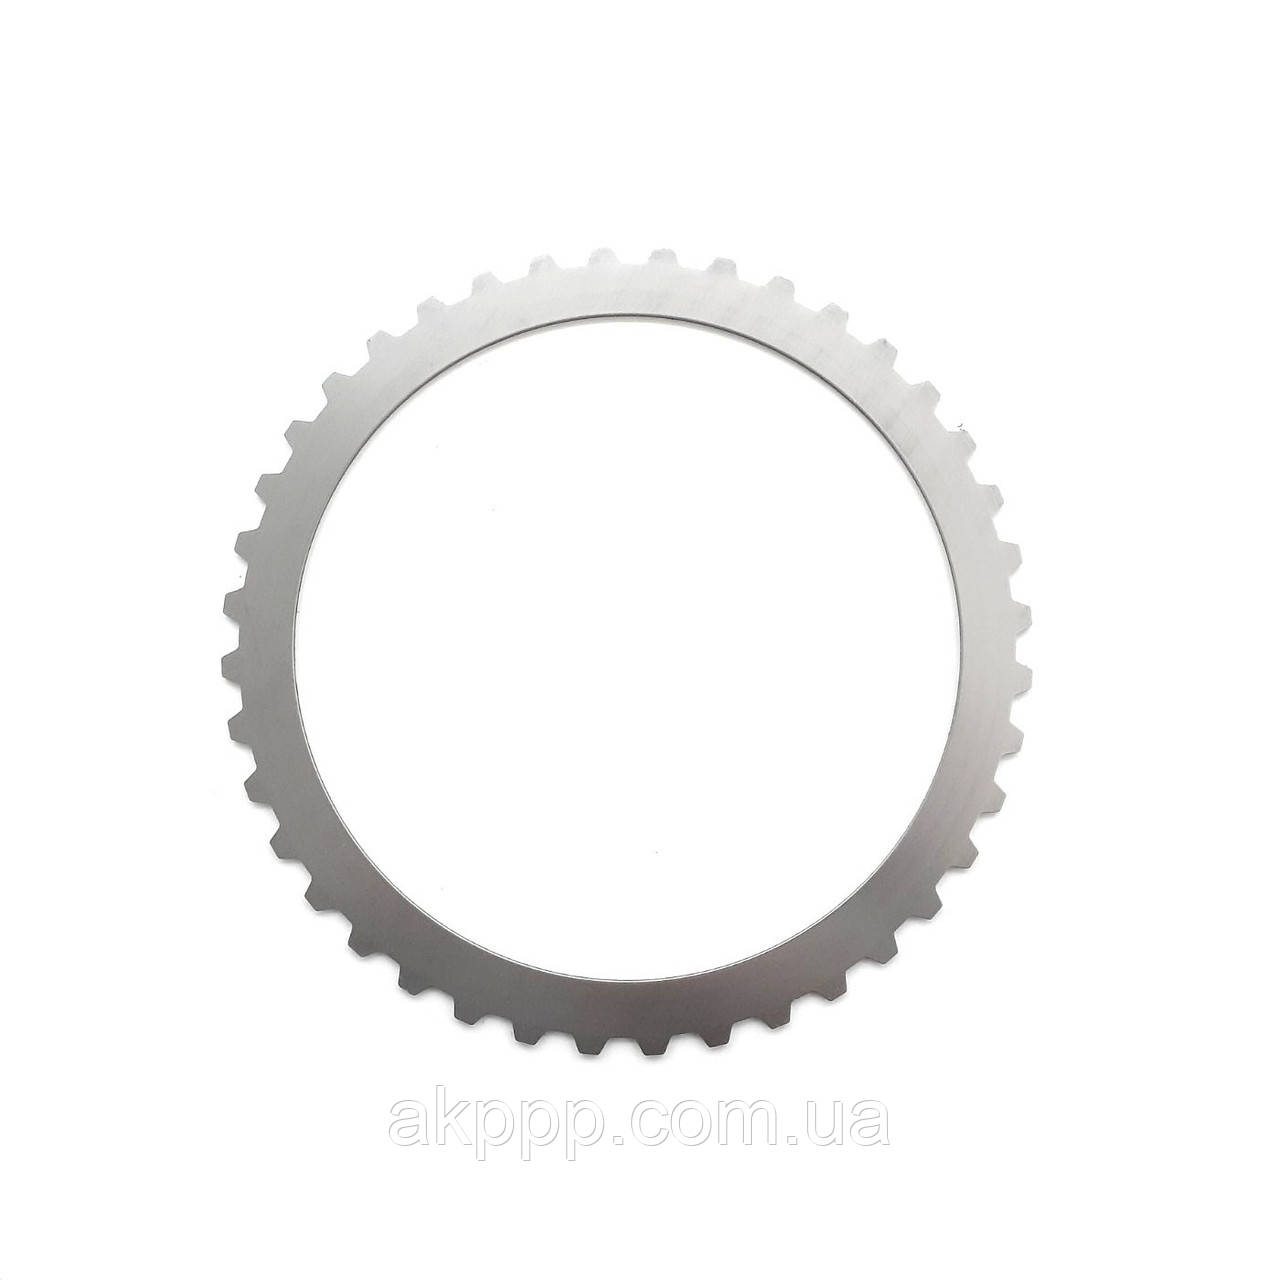 Диск стальной forward C1 (1,8мм / 144мм / 40 зубов) акпп U760E б/у